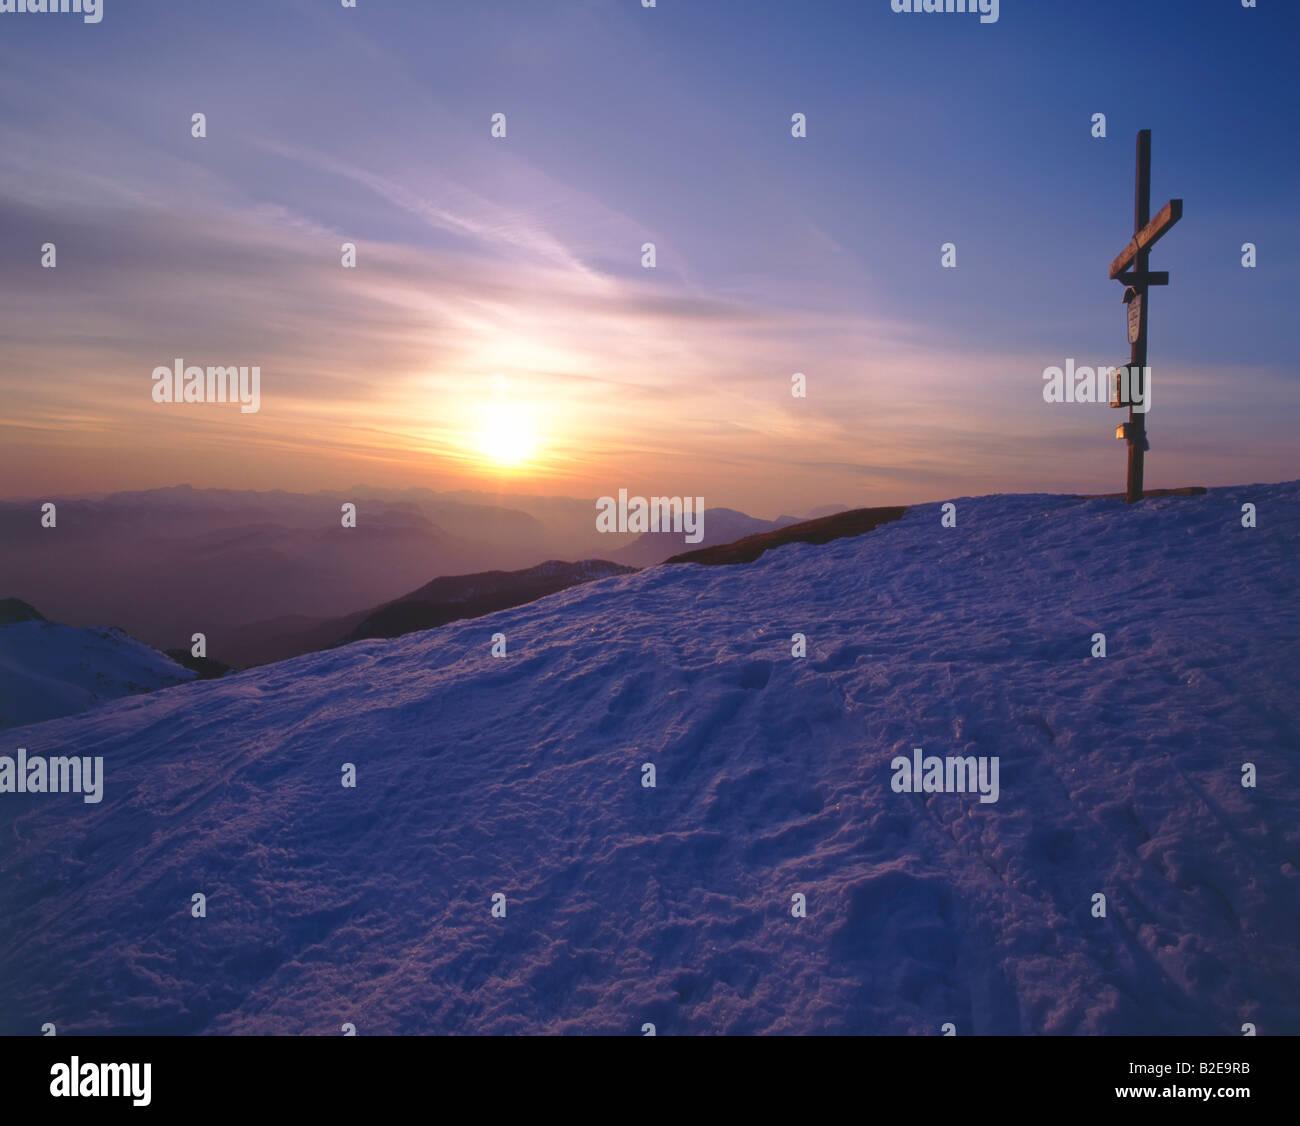 Salzburg on snowcovered mountain, Gamsfeld, Osterhorngruppe, Tennengau, Totes Gebirge, Salzburg, Austria Stock Photo